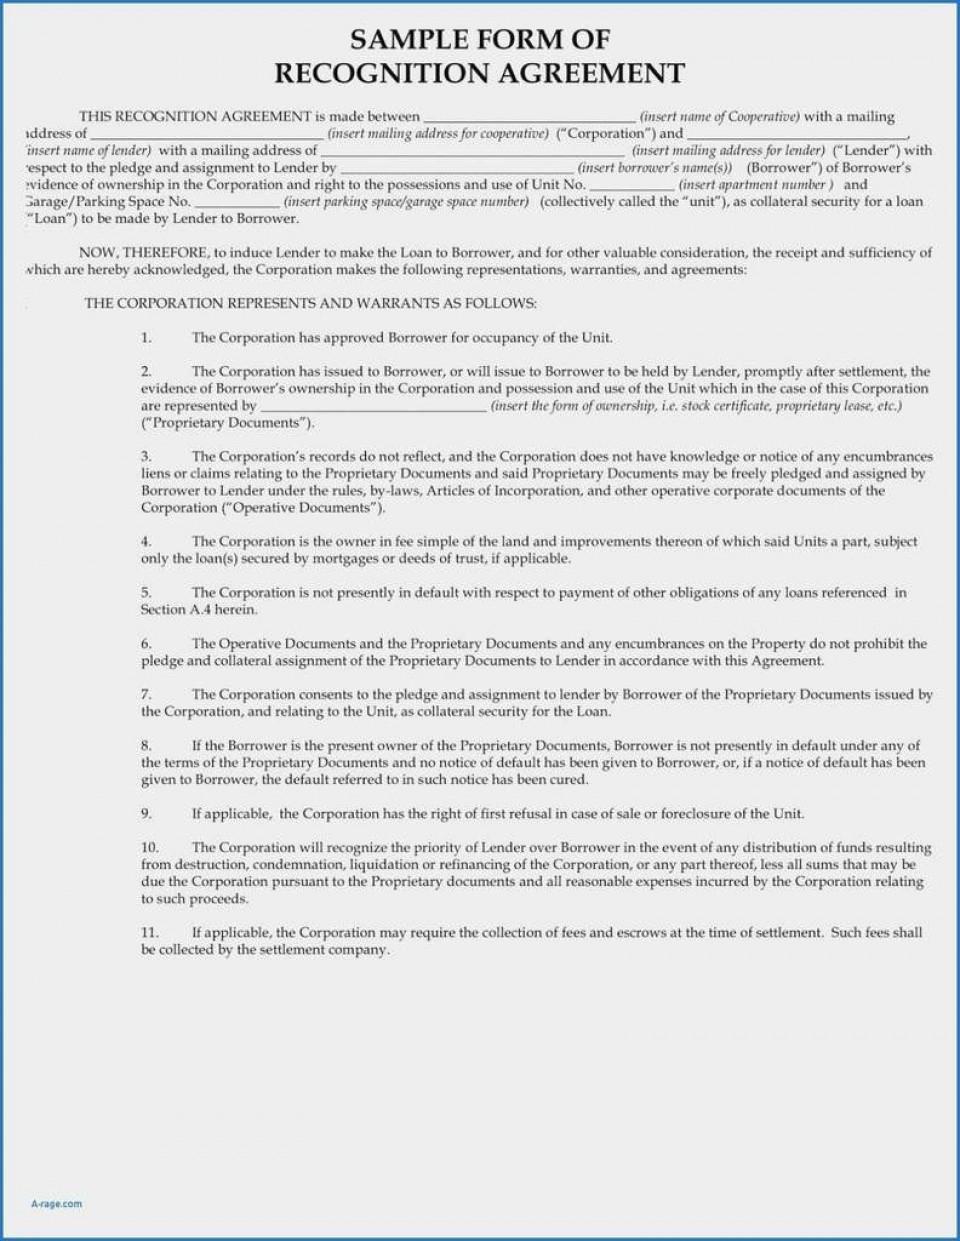 000 Wonderful Home Purchase Agreement Template Michigan Inspiration 960